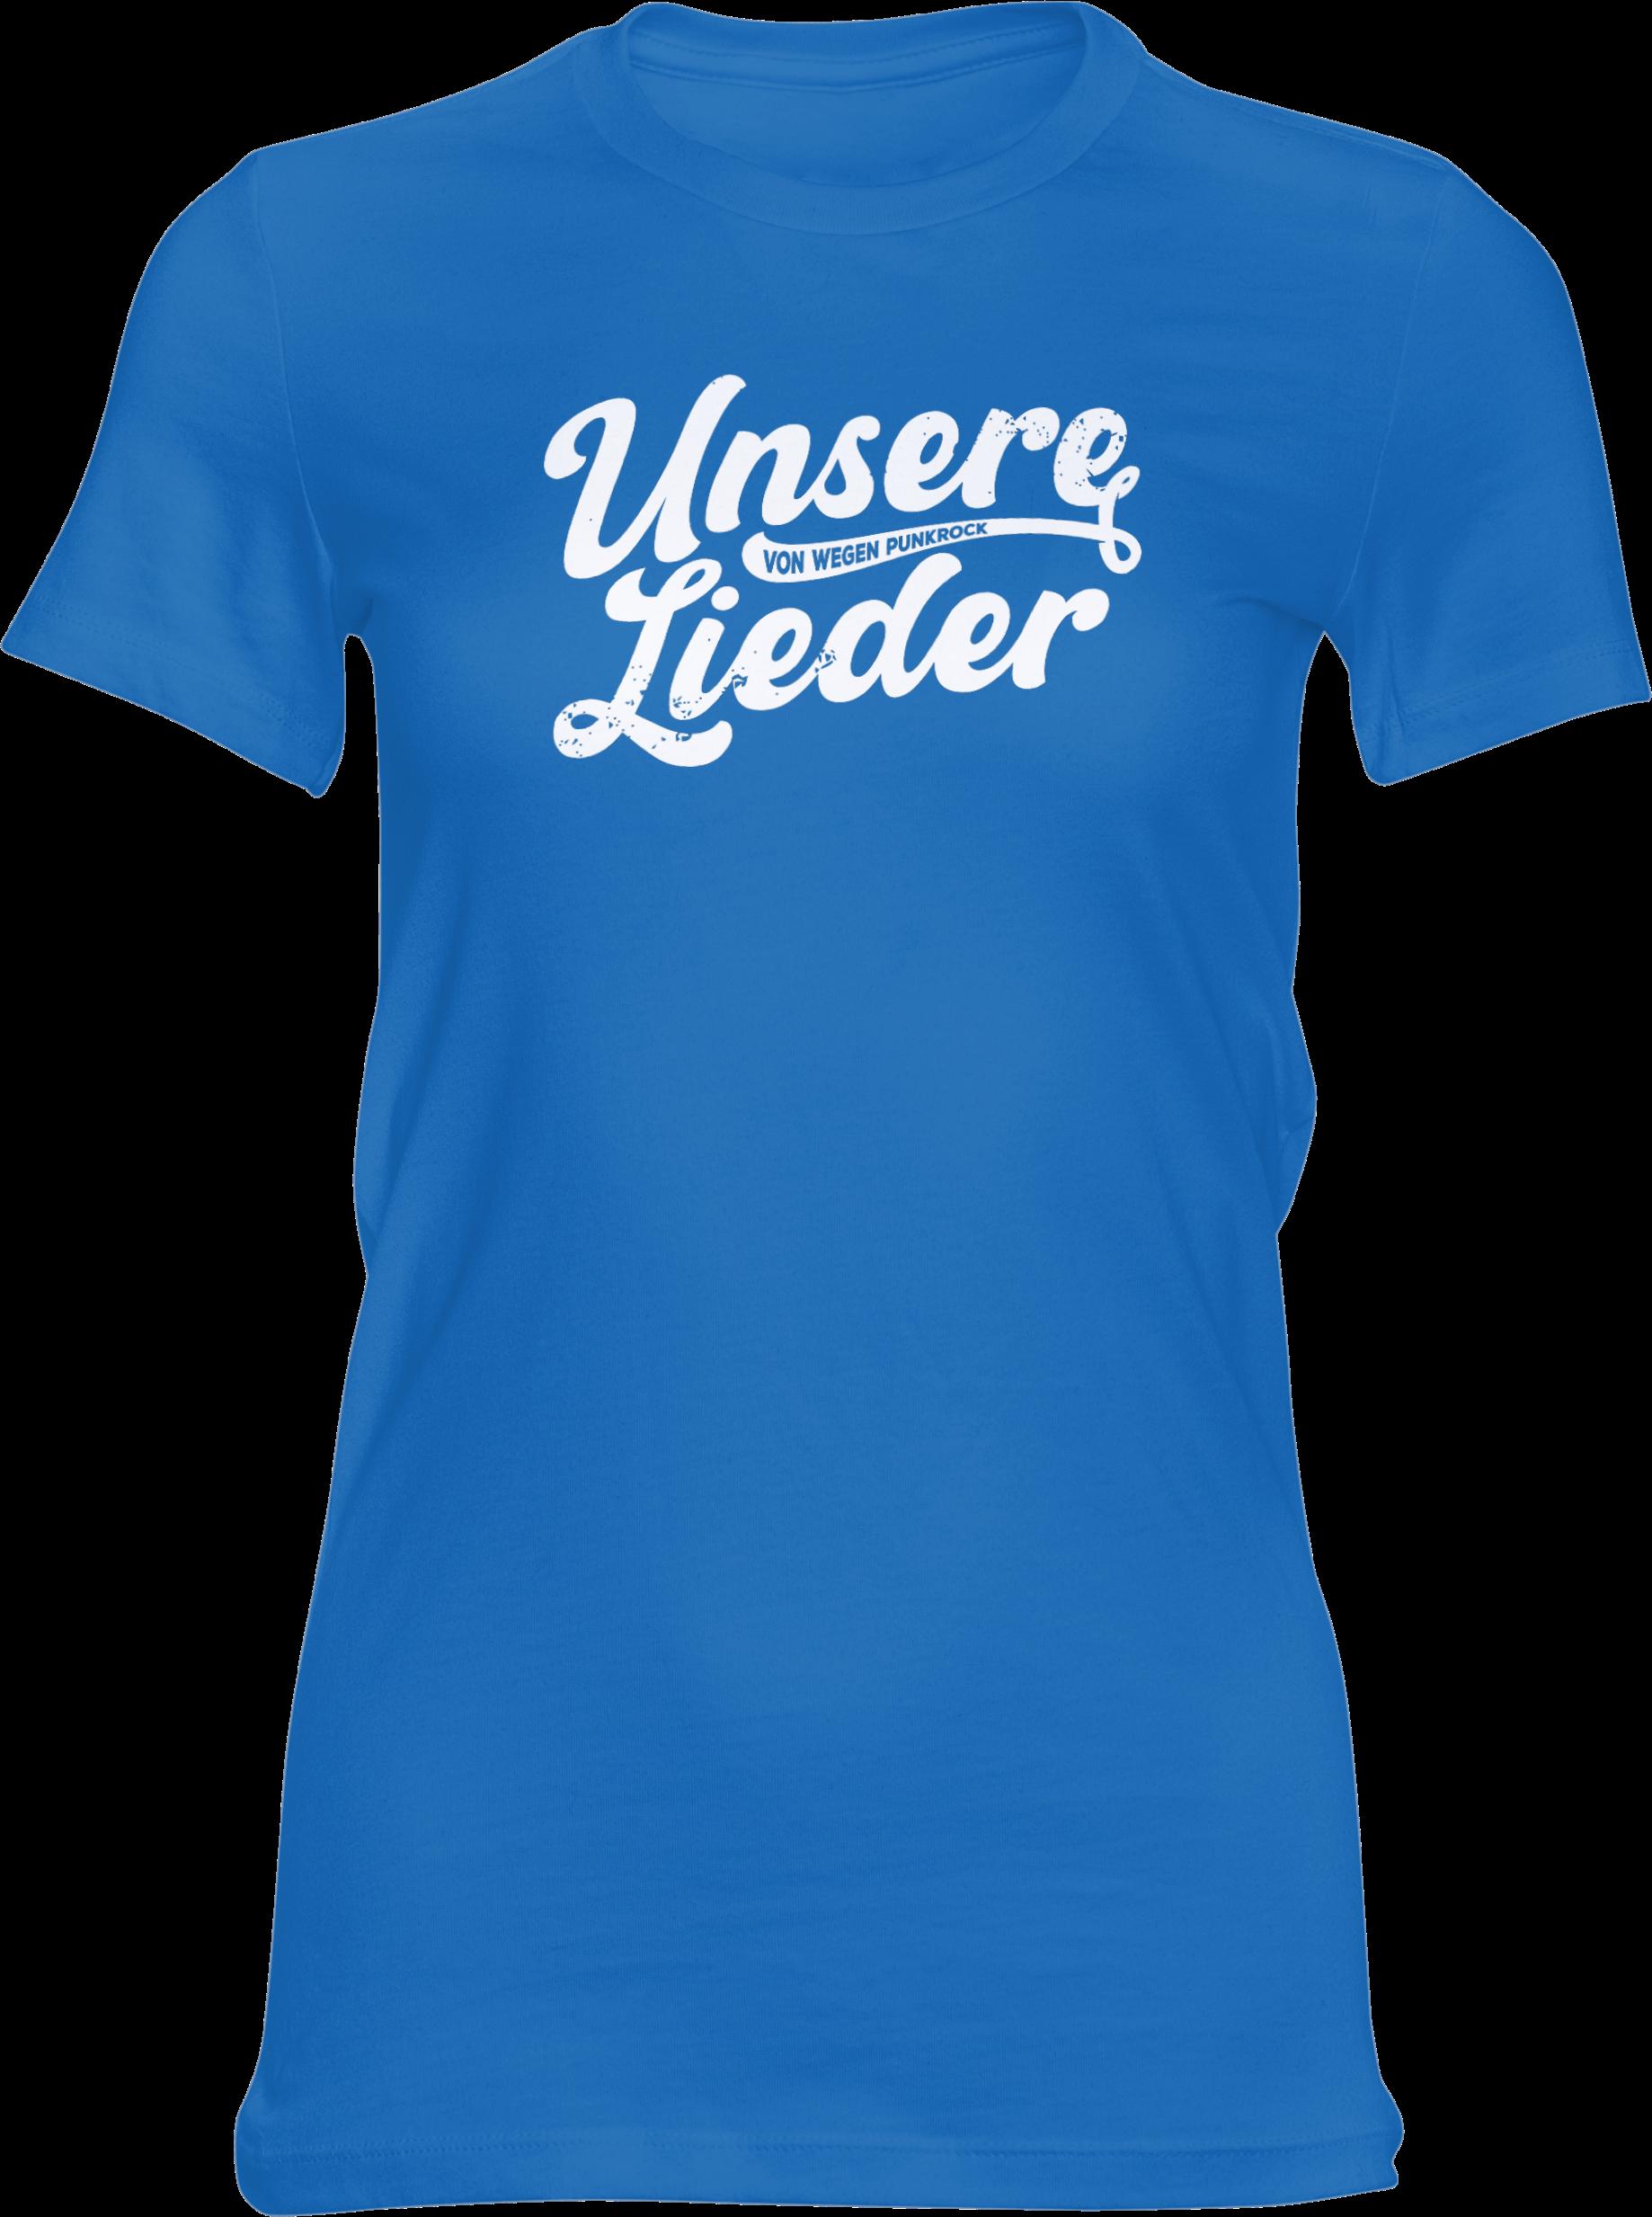 AOP – Unsere Lieder – Girlie-Shirt (blau)